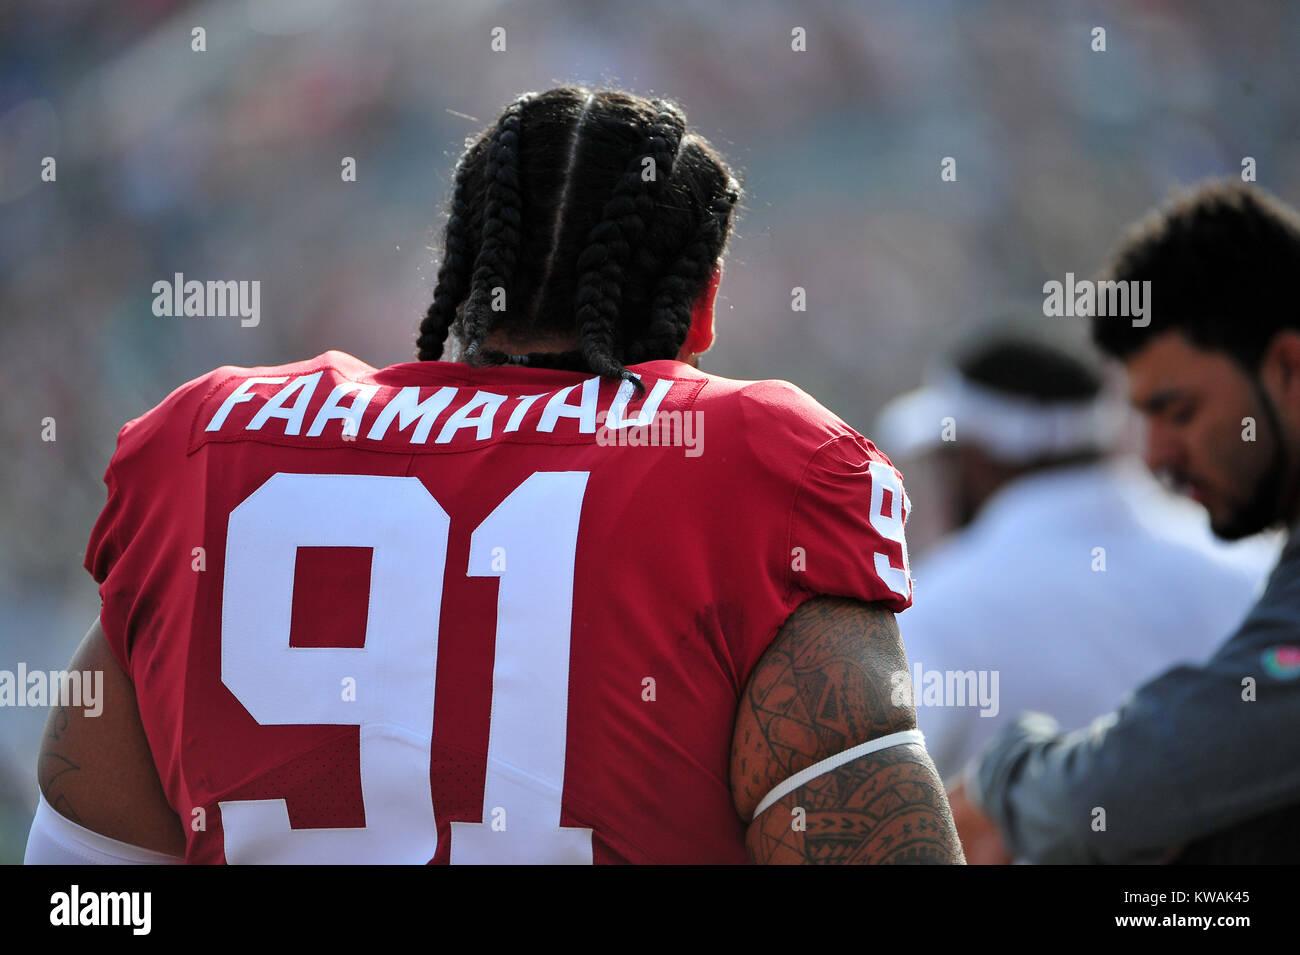 Pasadena, California, USA. 01st Jan, 2018. Oklahoma Sooners defensive tackle Dillon Faamatau #91 during the 2018 Stock Photo